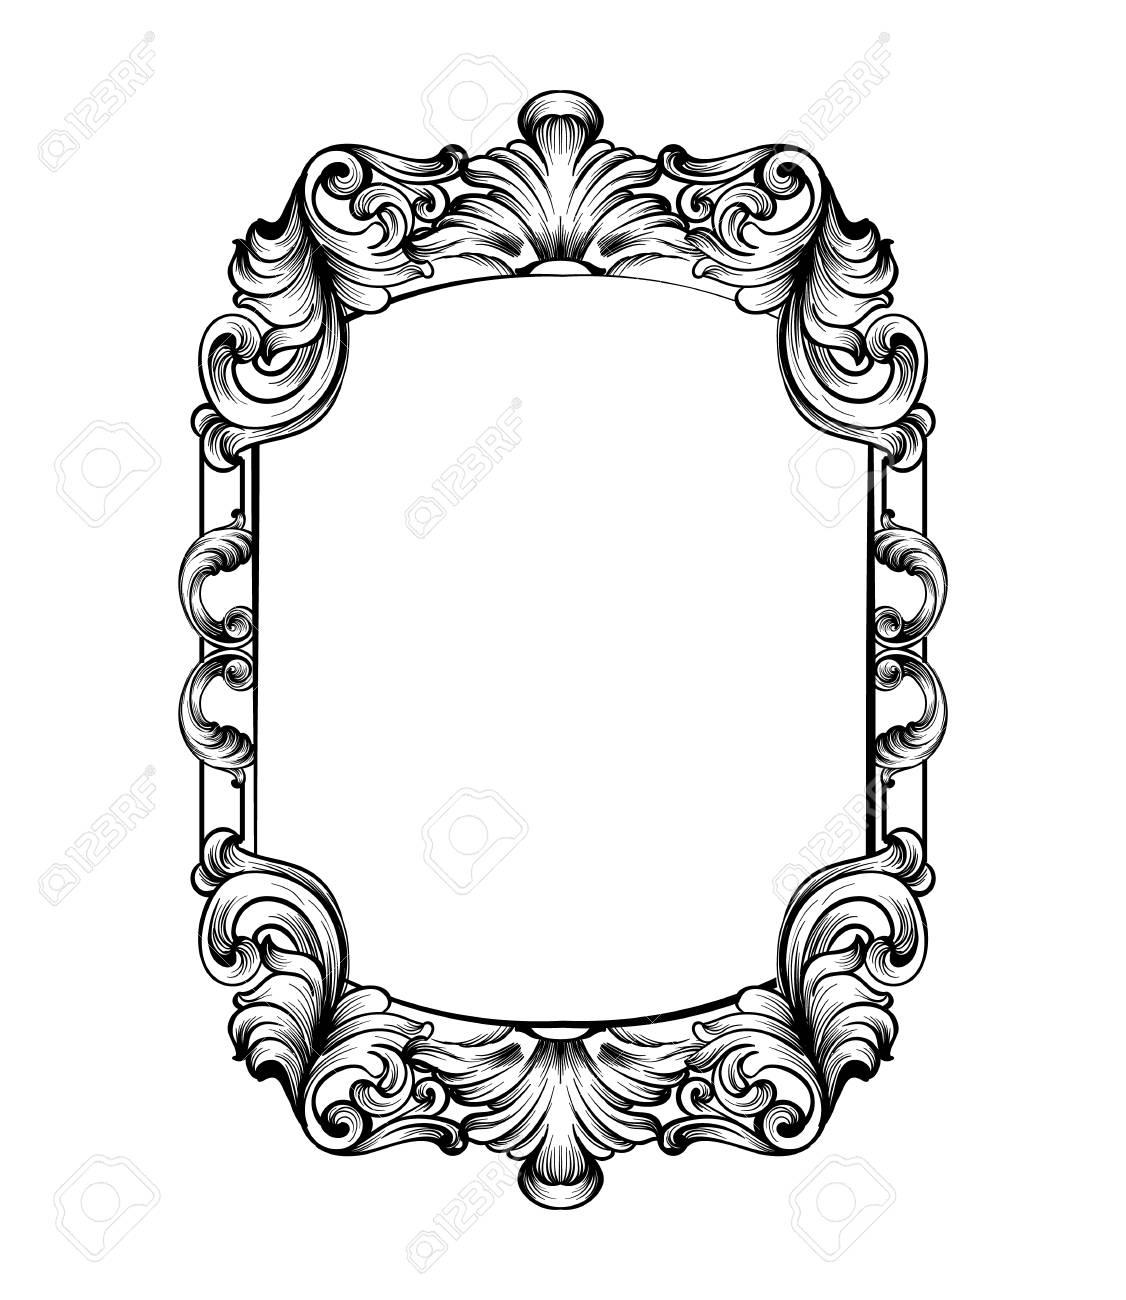 mirror frame. Exellent Mirror Archivio Fotografico  Baroque Mirror Frame Vector Imperial Decor Design  Elements Rich Encarved Ornaments Line Arts And Mirror Frame